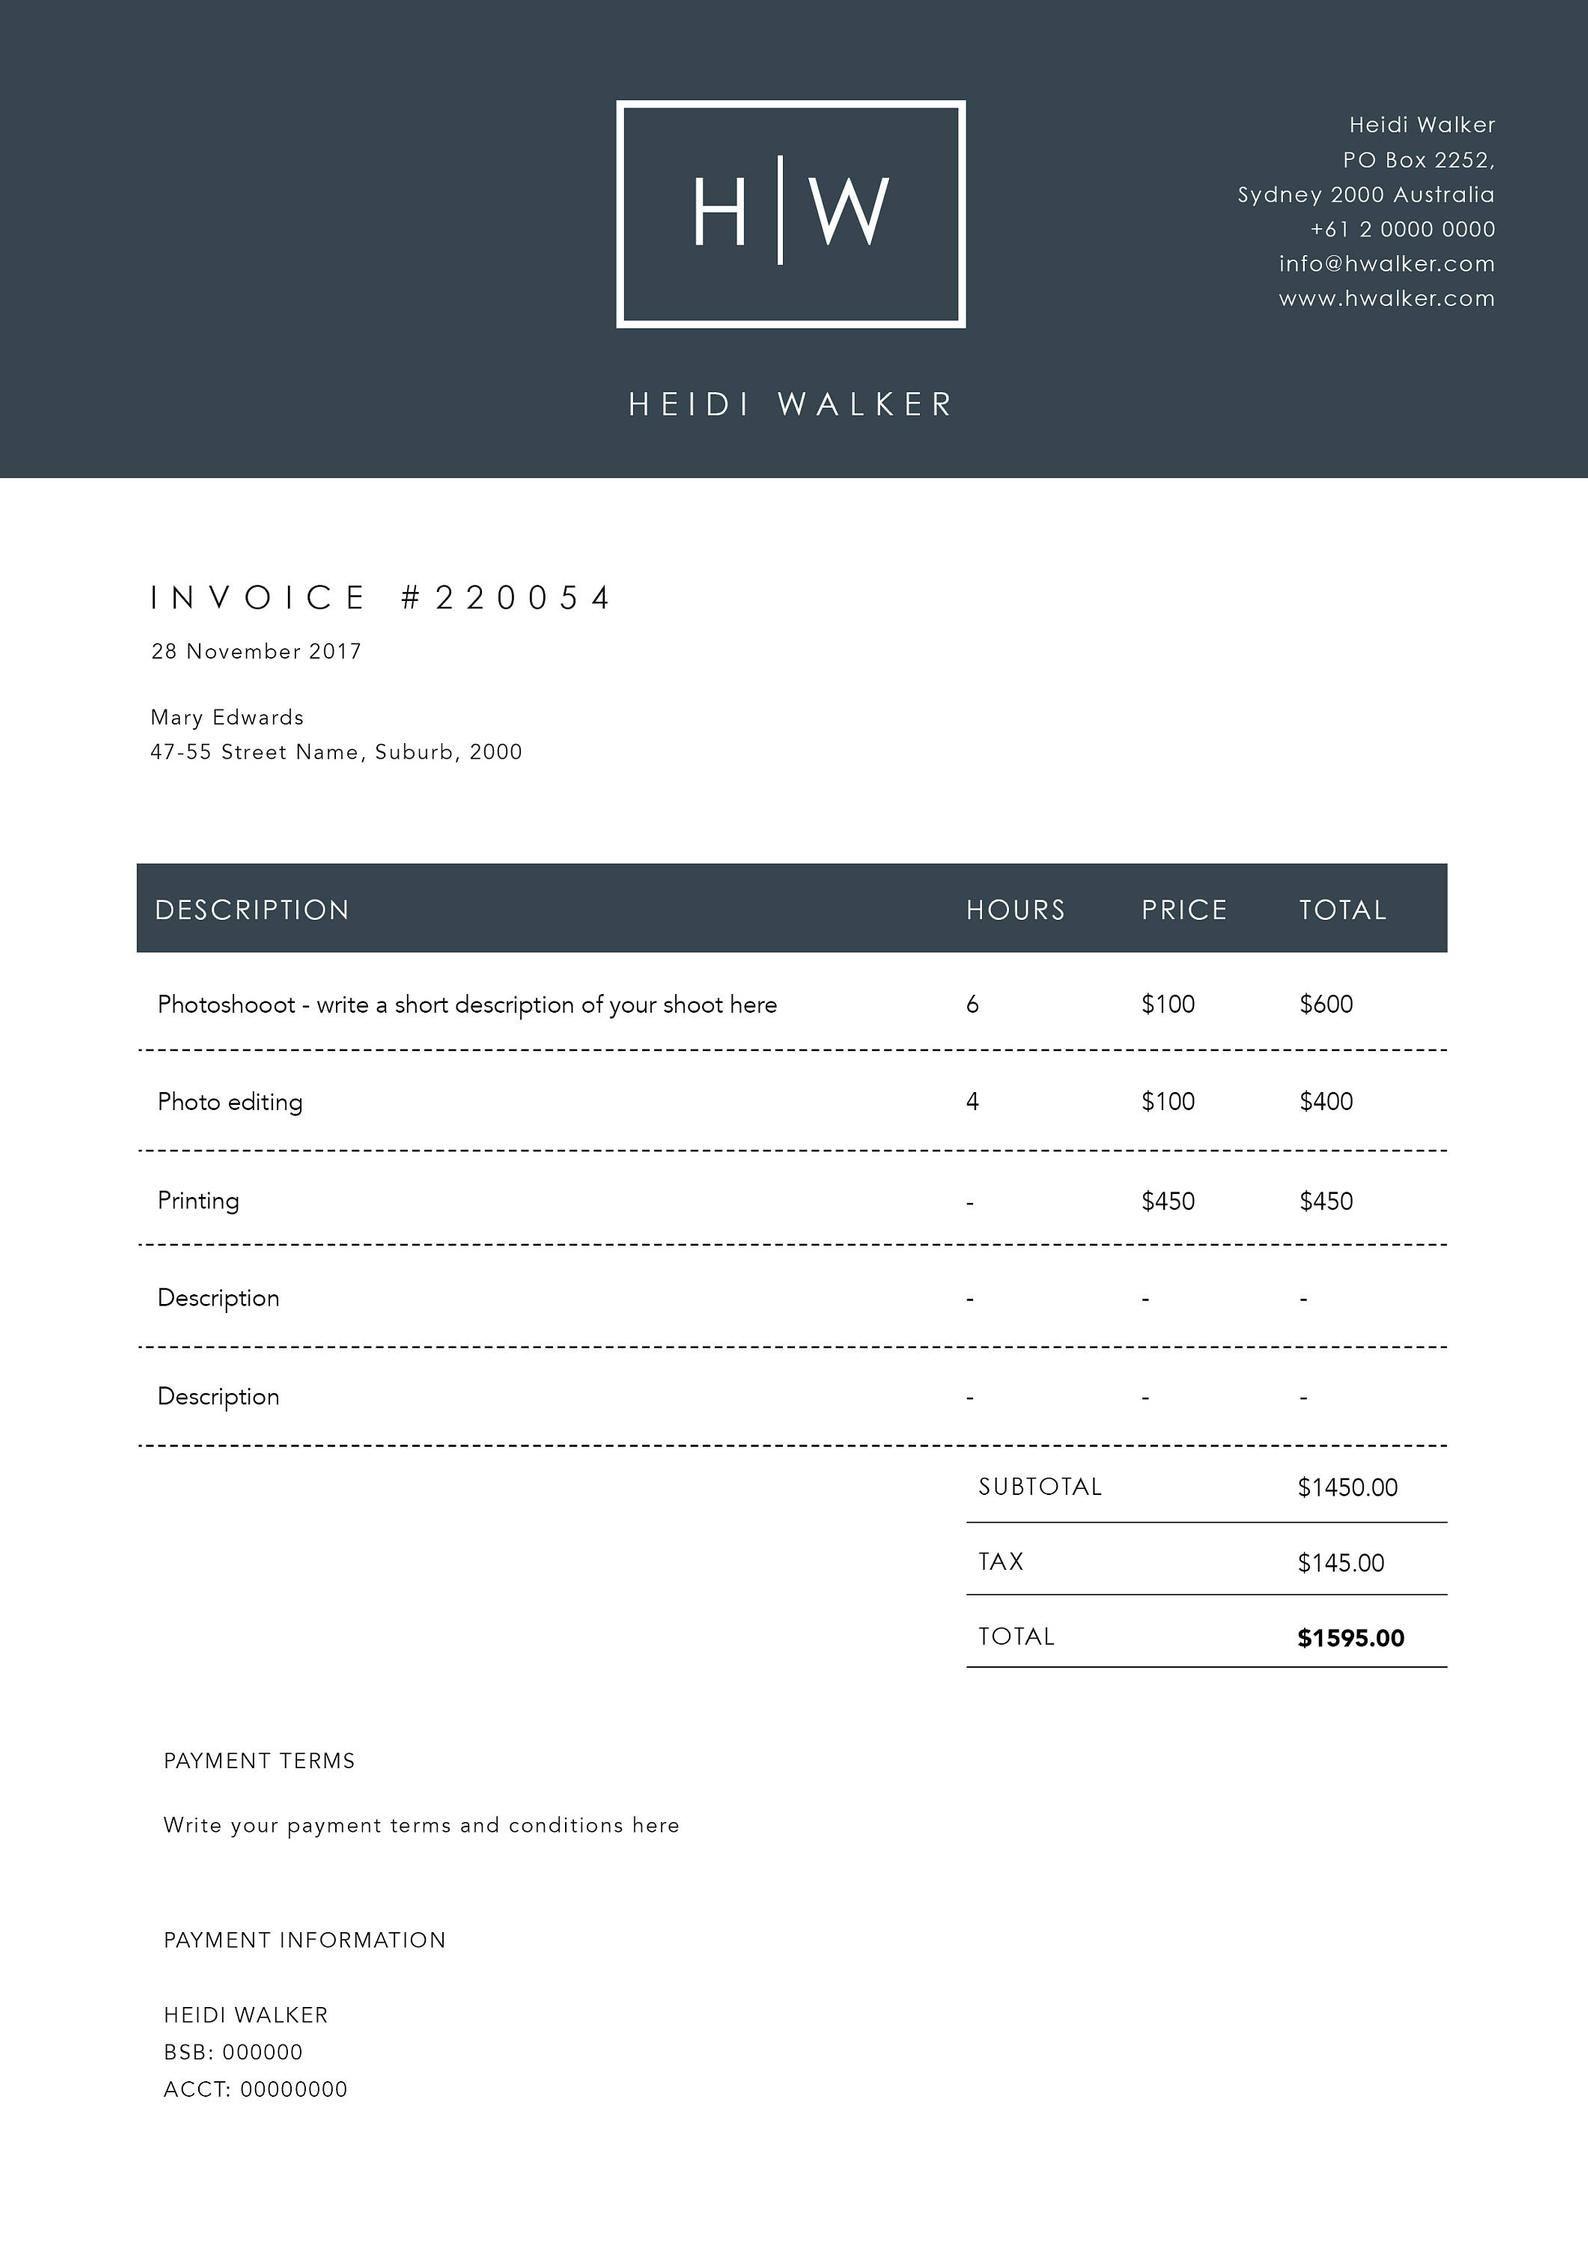 Photographer Invoice Template Invoice Design Receipt Etsy Invoice Design Invoice Template Invoice Design Template